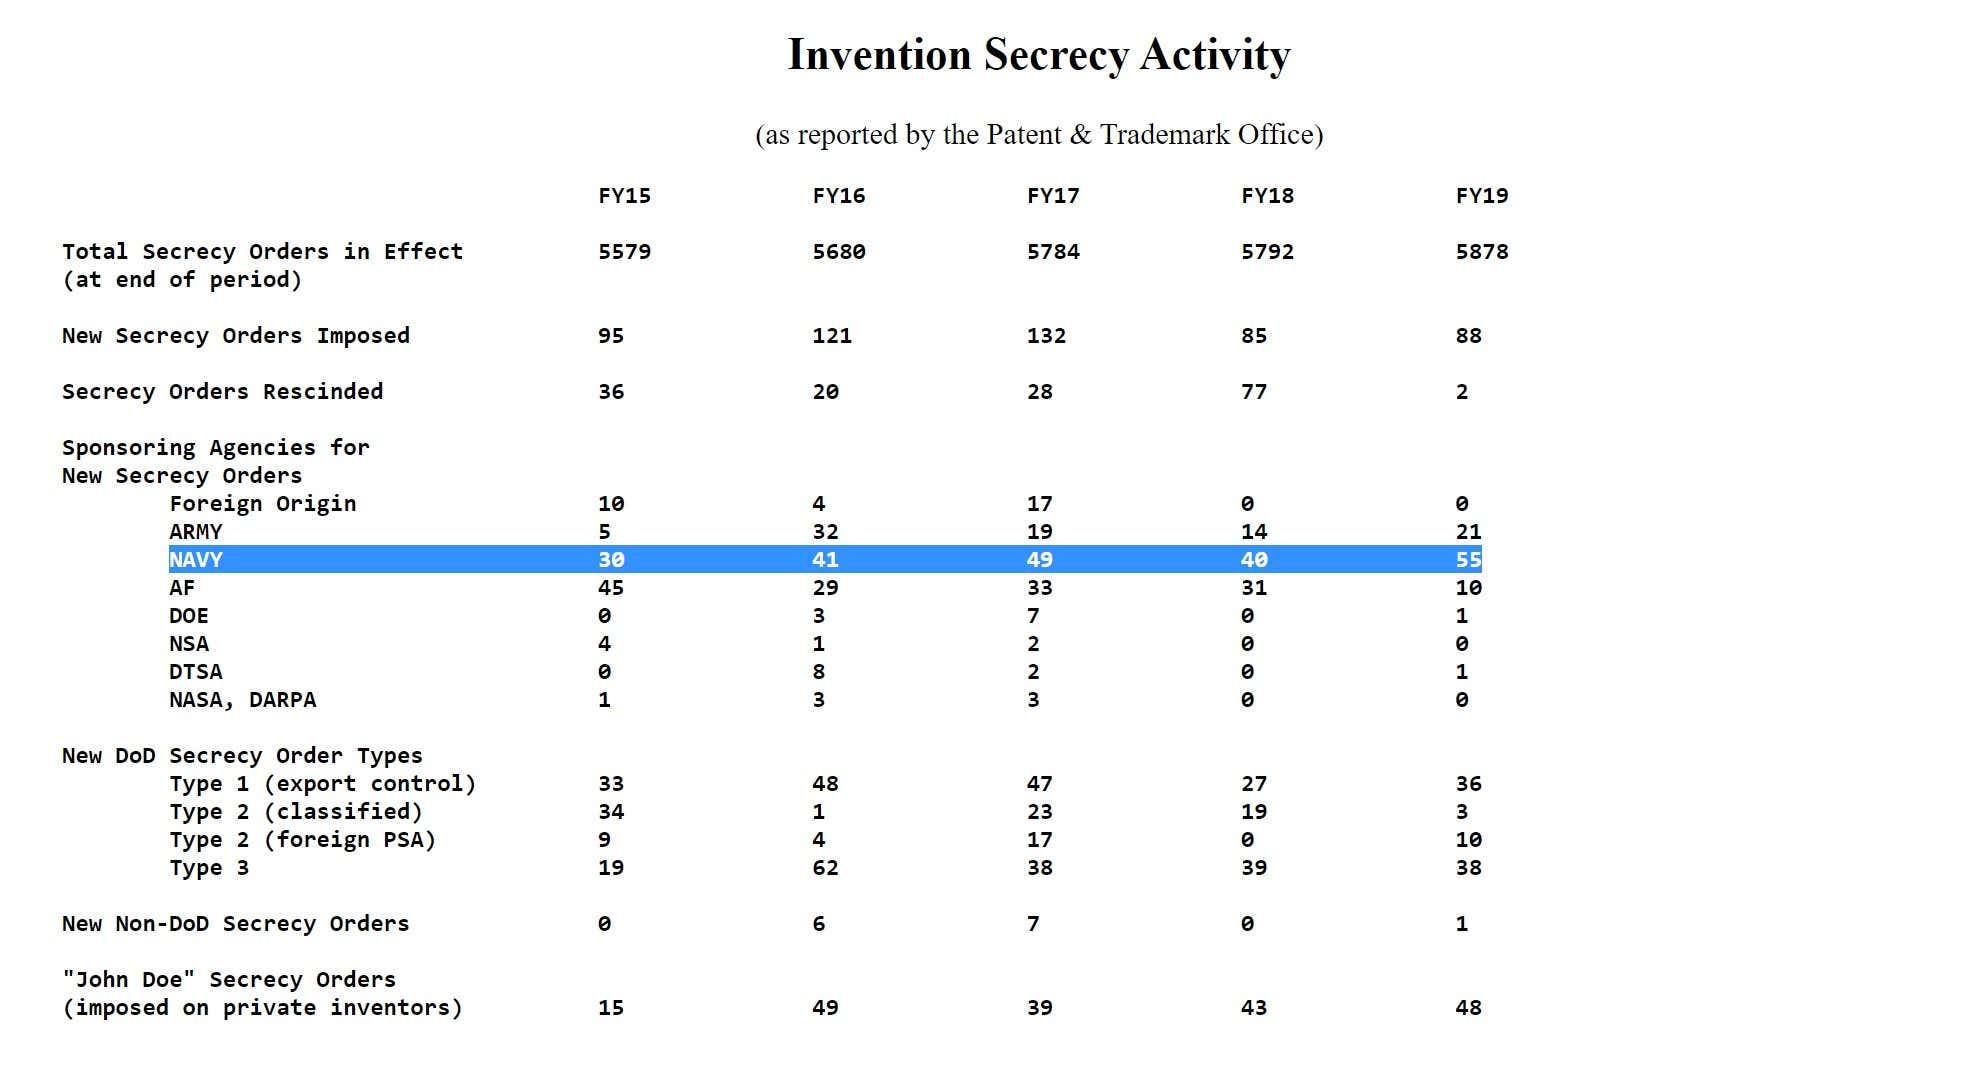 The Secretive Inventor Of The Navy's Bizarre 'UFO Patents' Finally Talks Message-editor%2F1579637347857-fasinventionsecrecystatsnavy